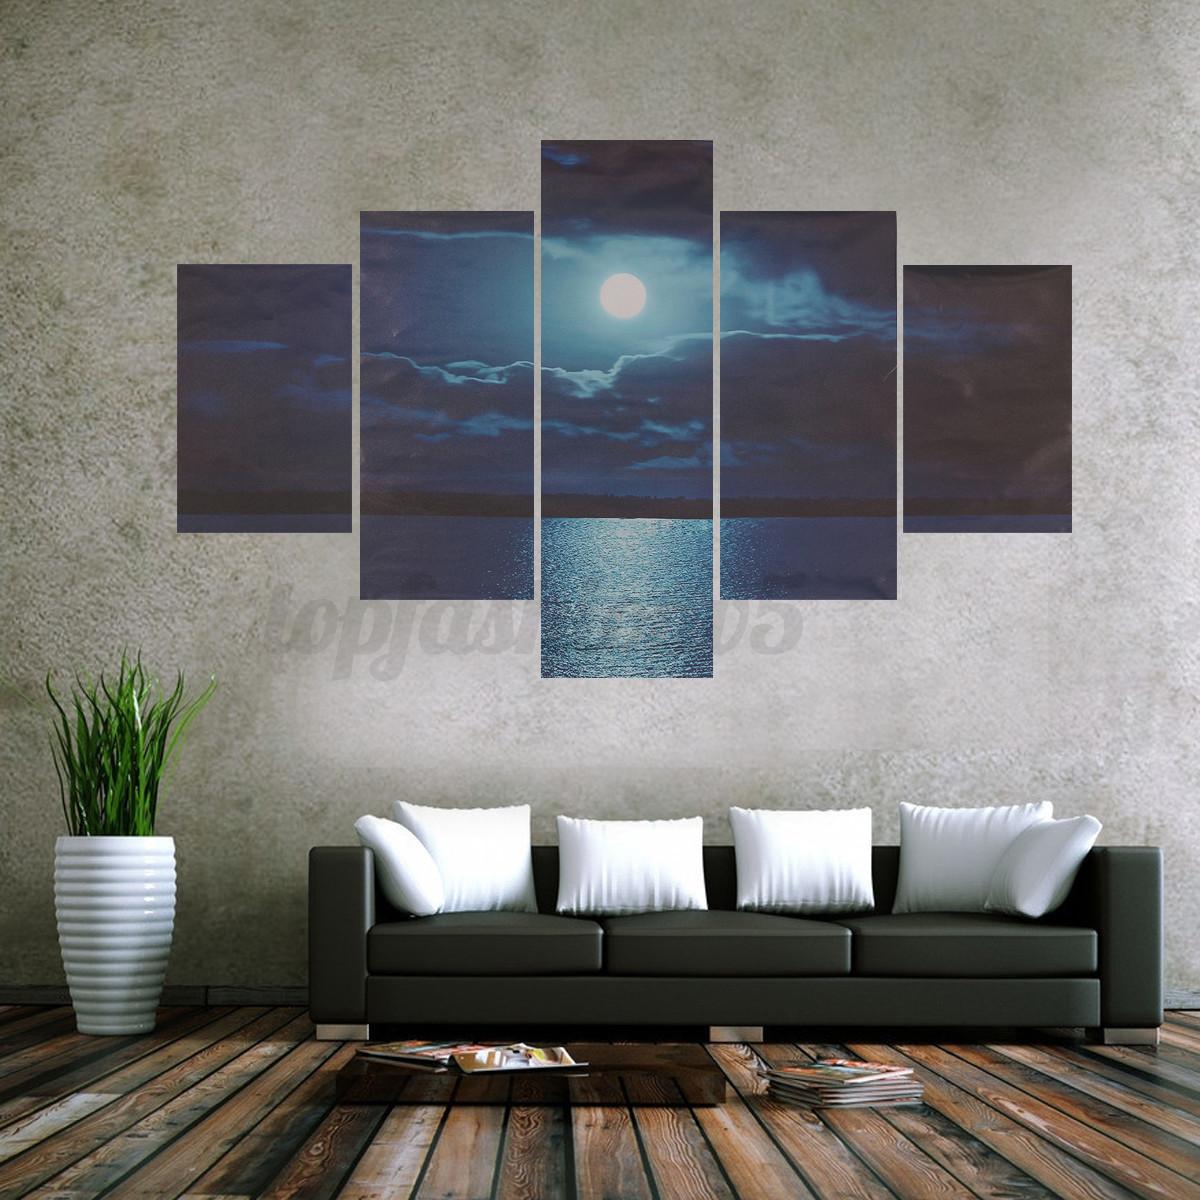 Moderno multistyle stampa tela arredamento arredo casa for Arte e arredo